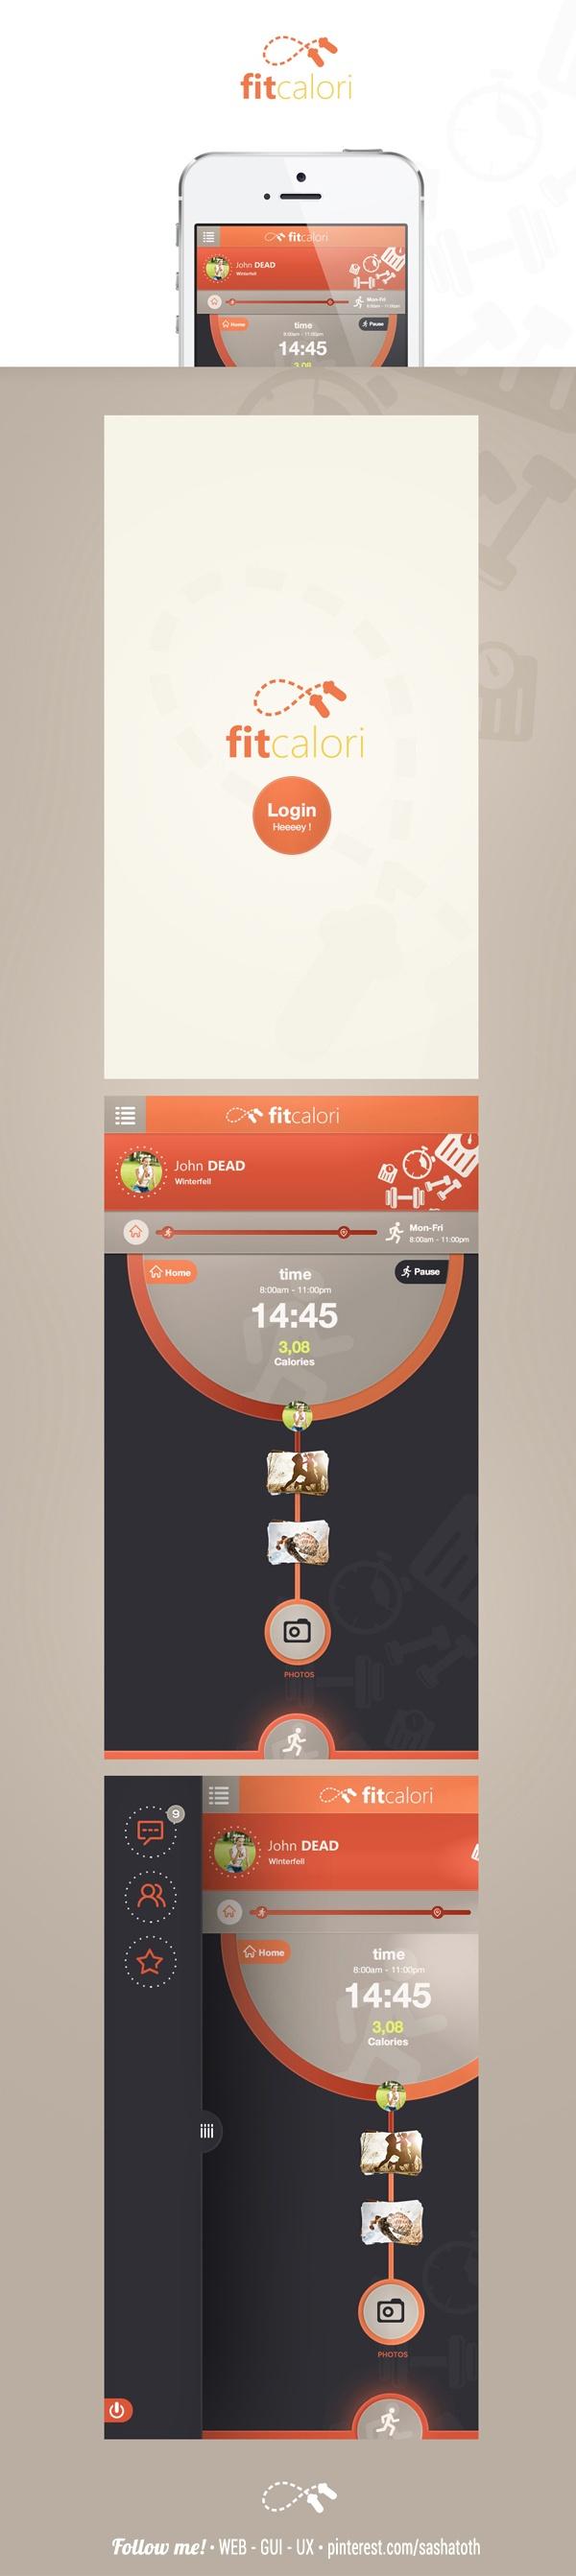 Fitcalori app concept by Cüneyt SEN, via Behance